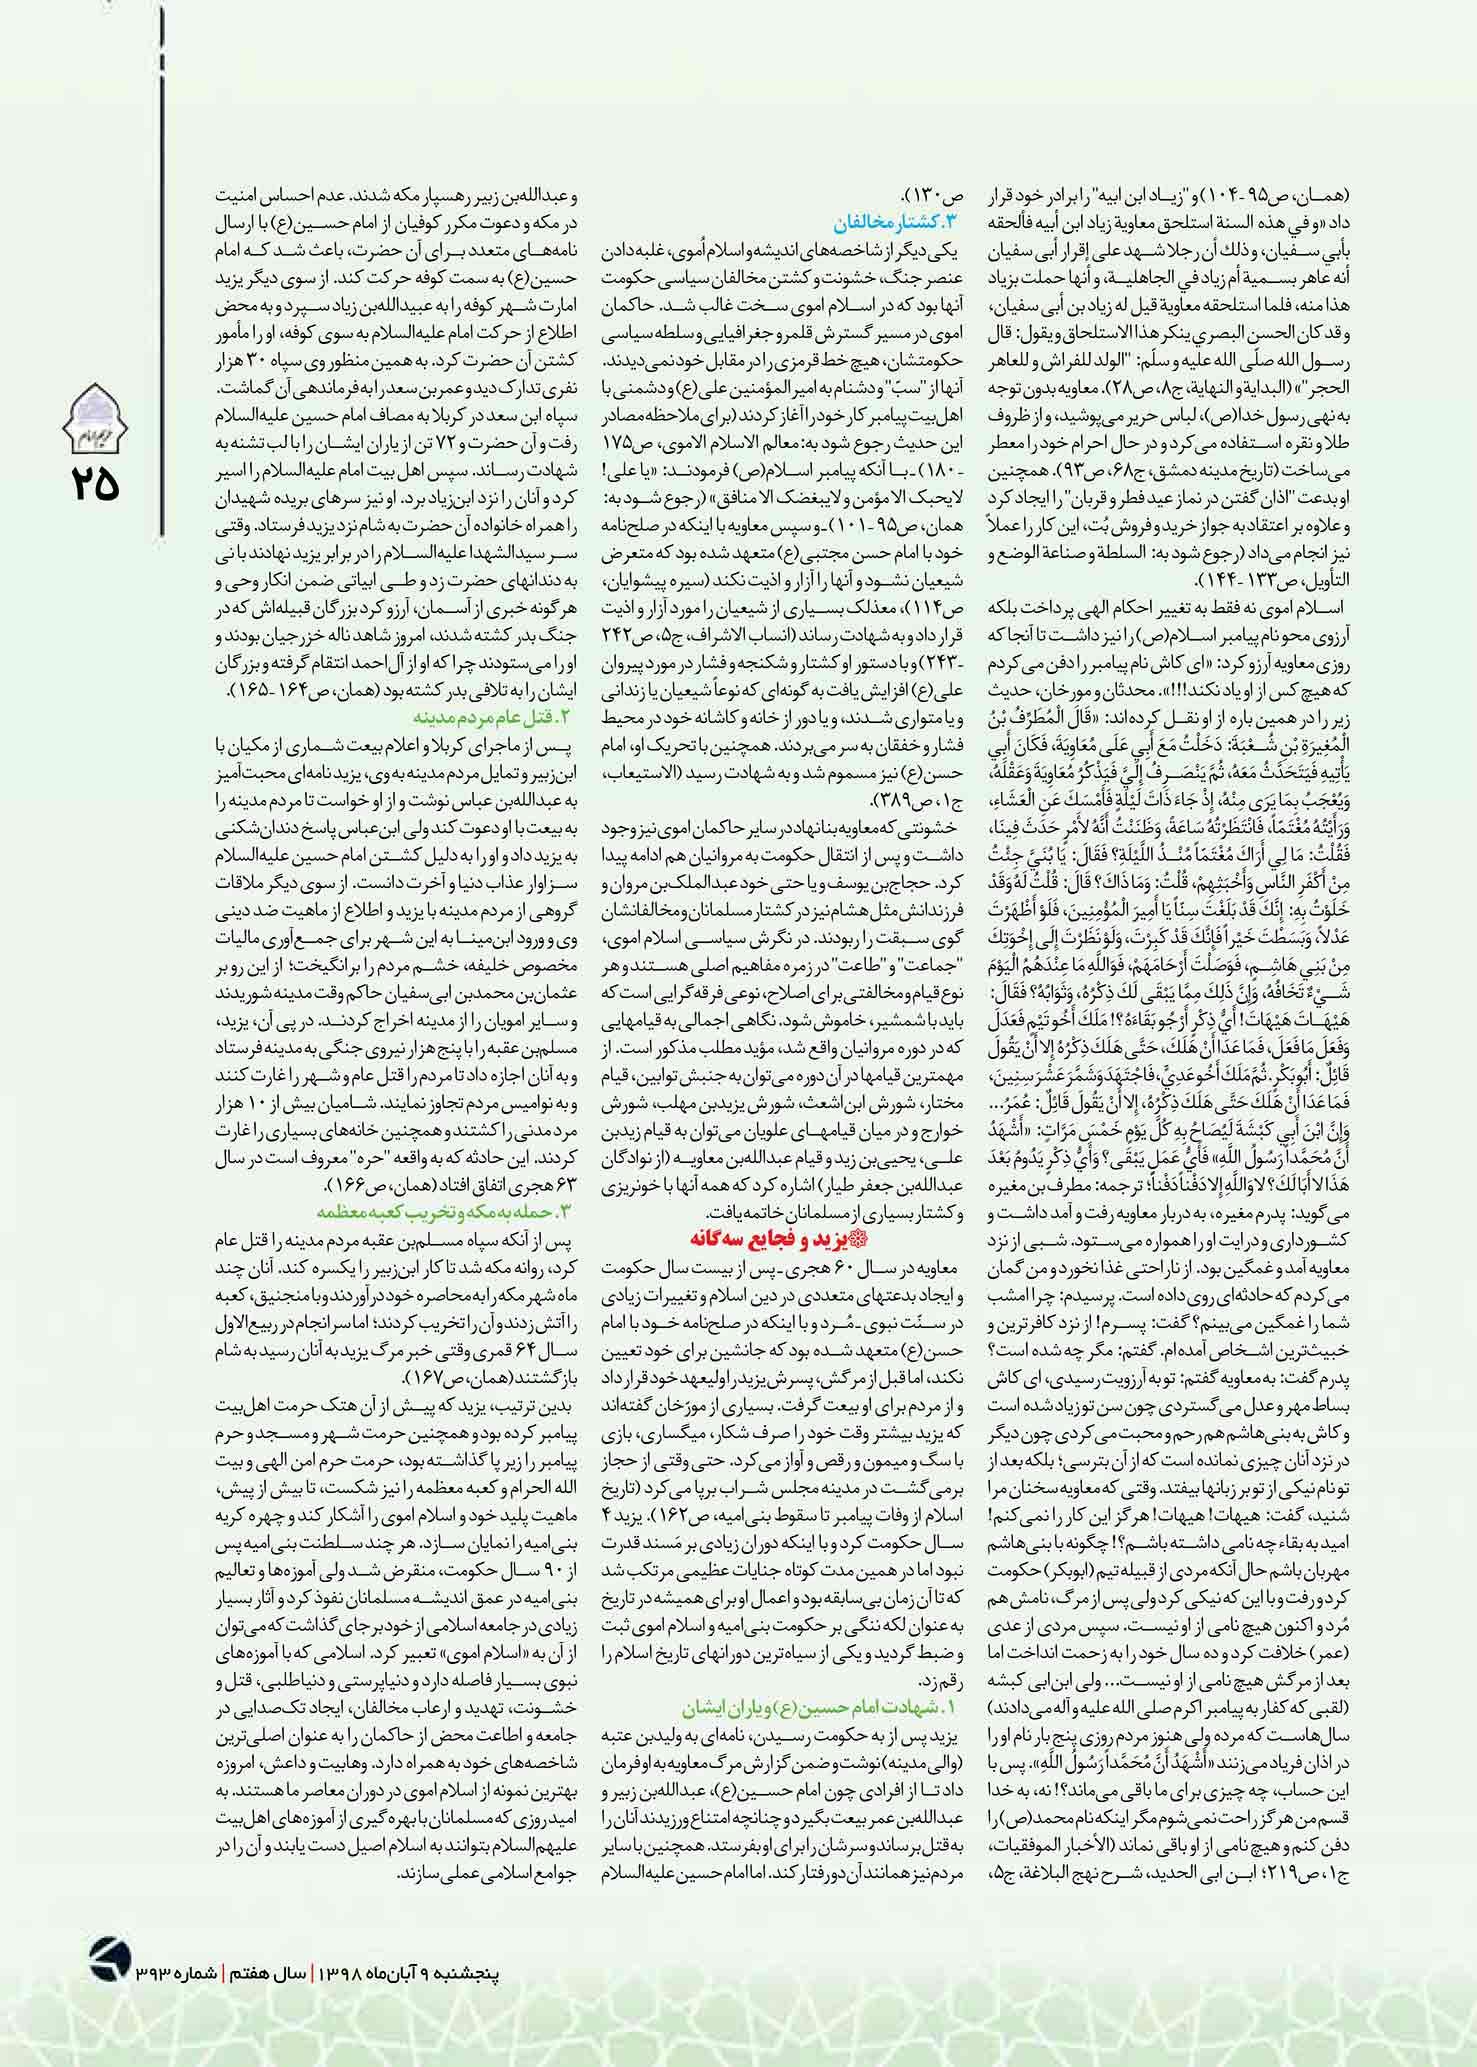 C:\Users\a.khalojini.ICPIKW\Desktop\393\@harim_emam393-25.jpg